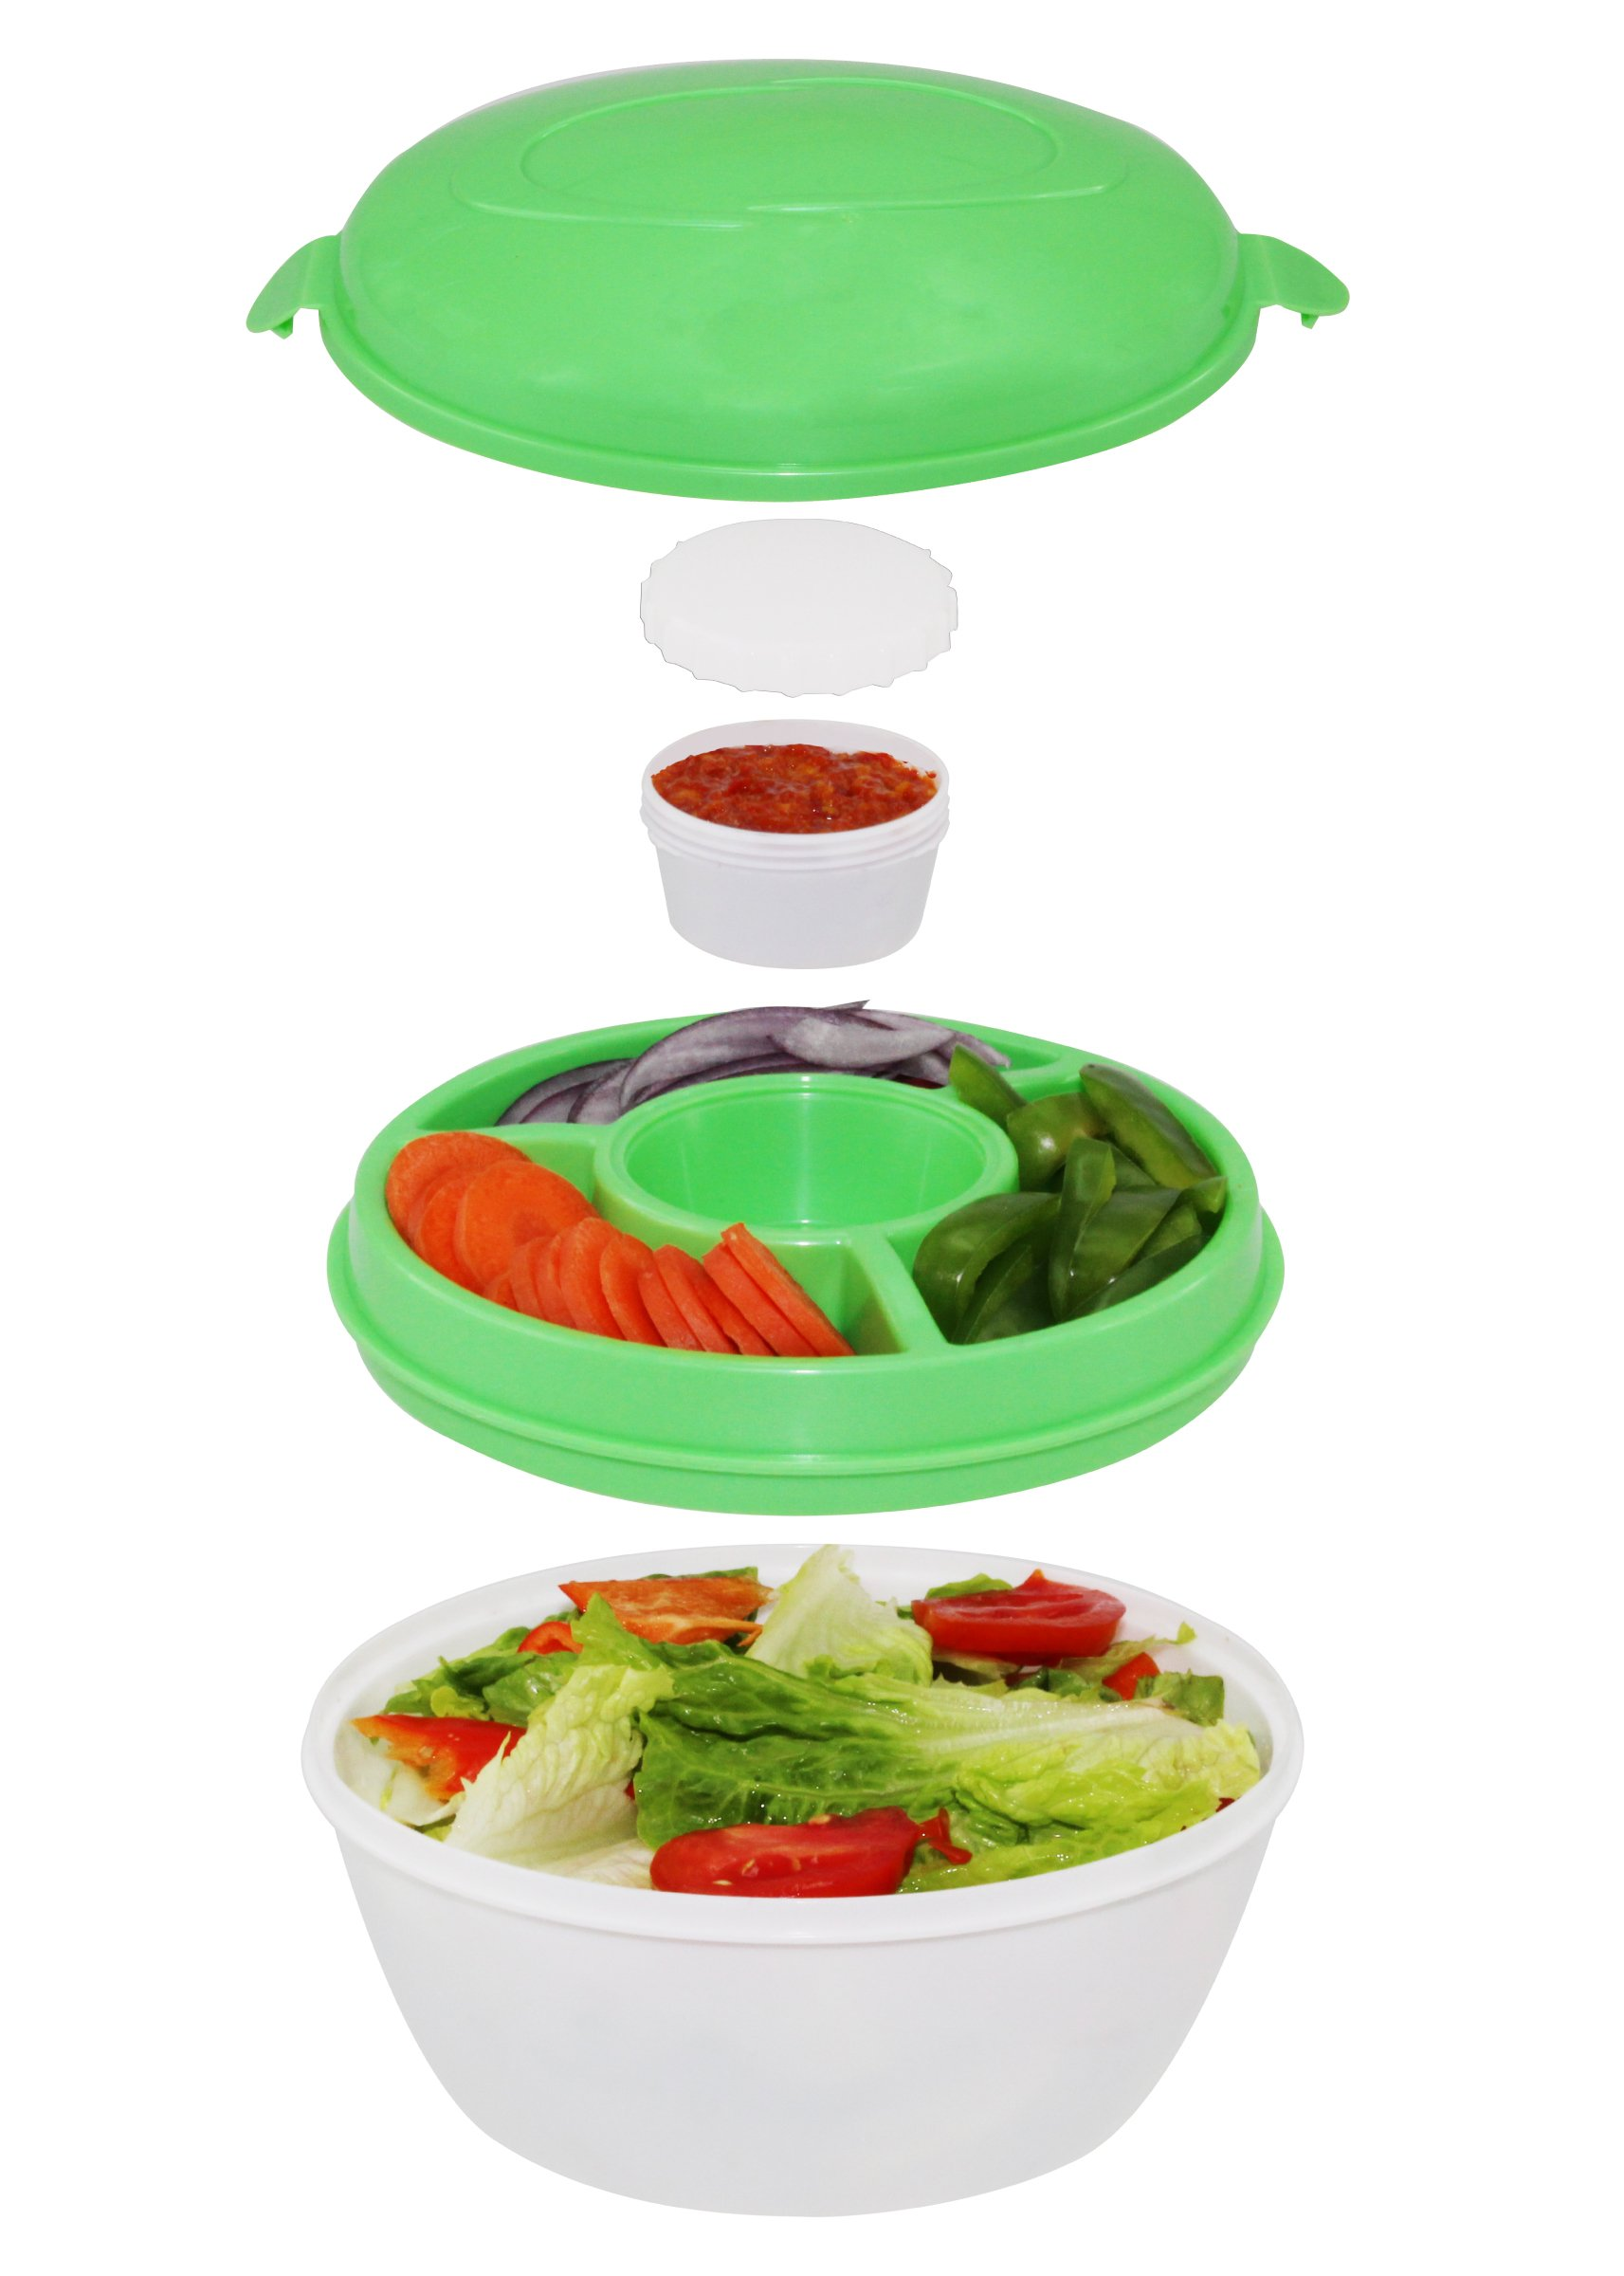 Chiller Bowl - Portable Salad Kit, 5 Piece Set by Grand Innovation